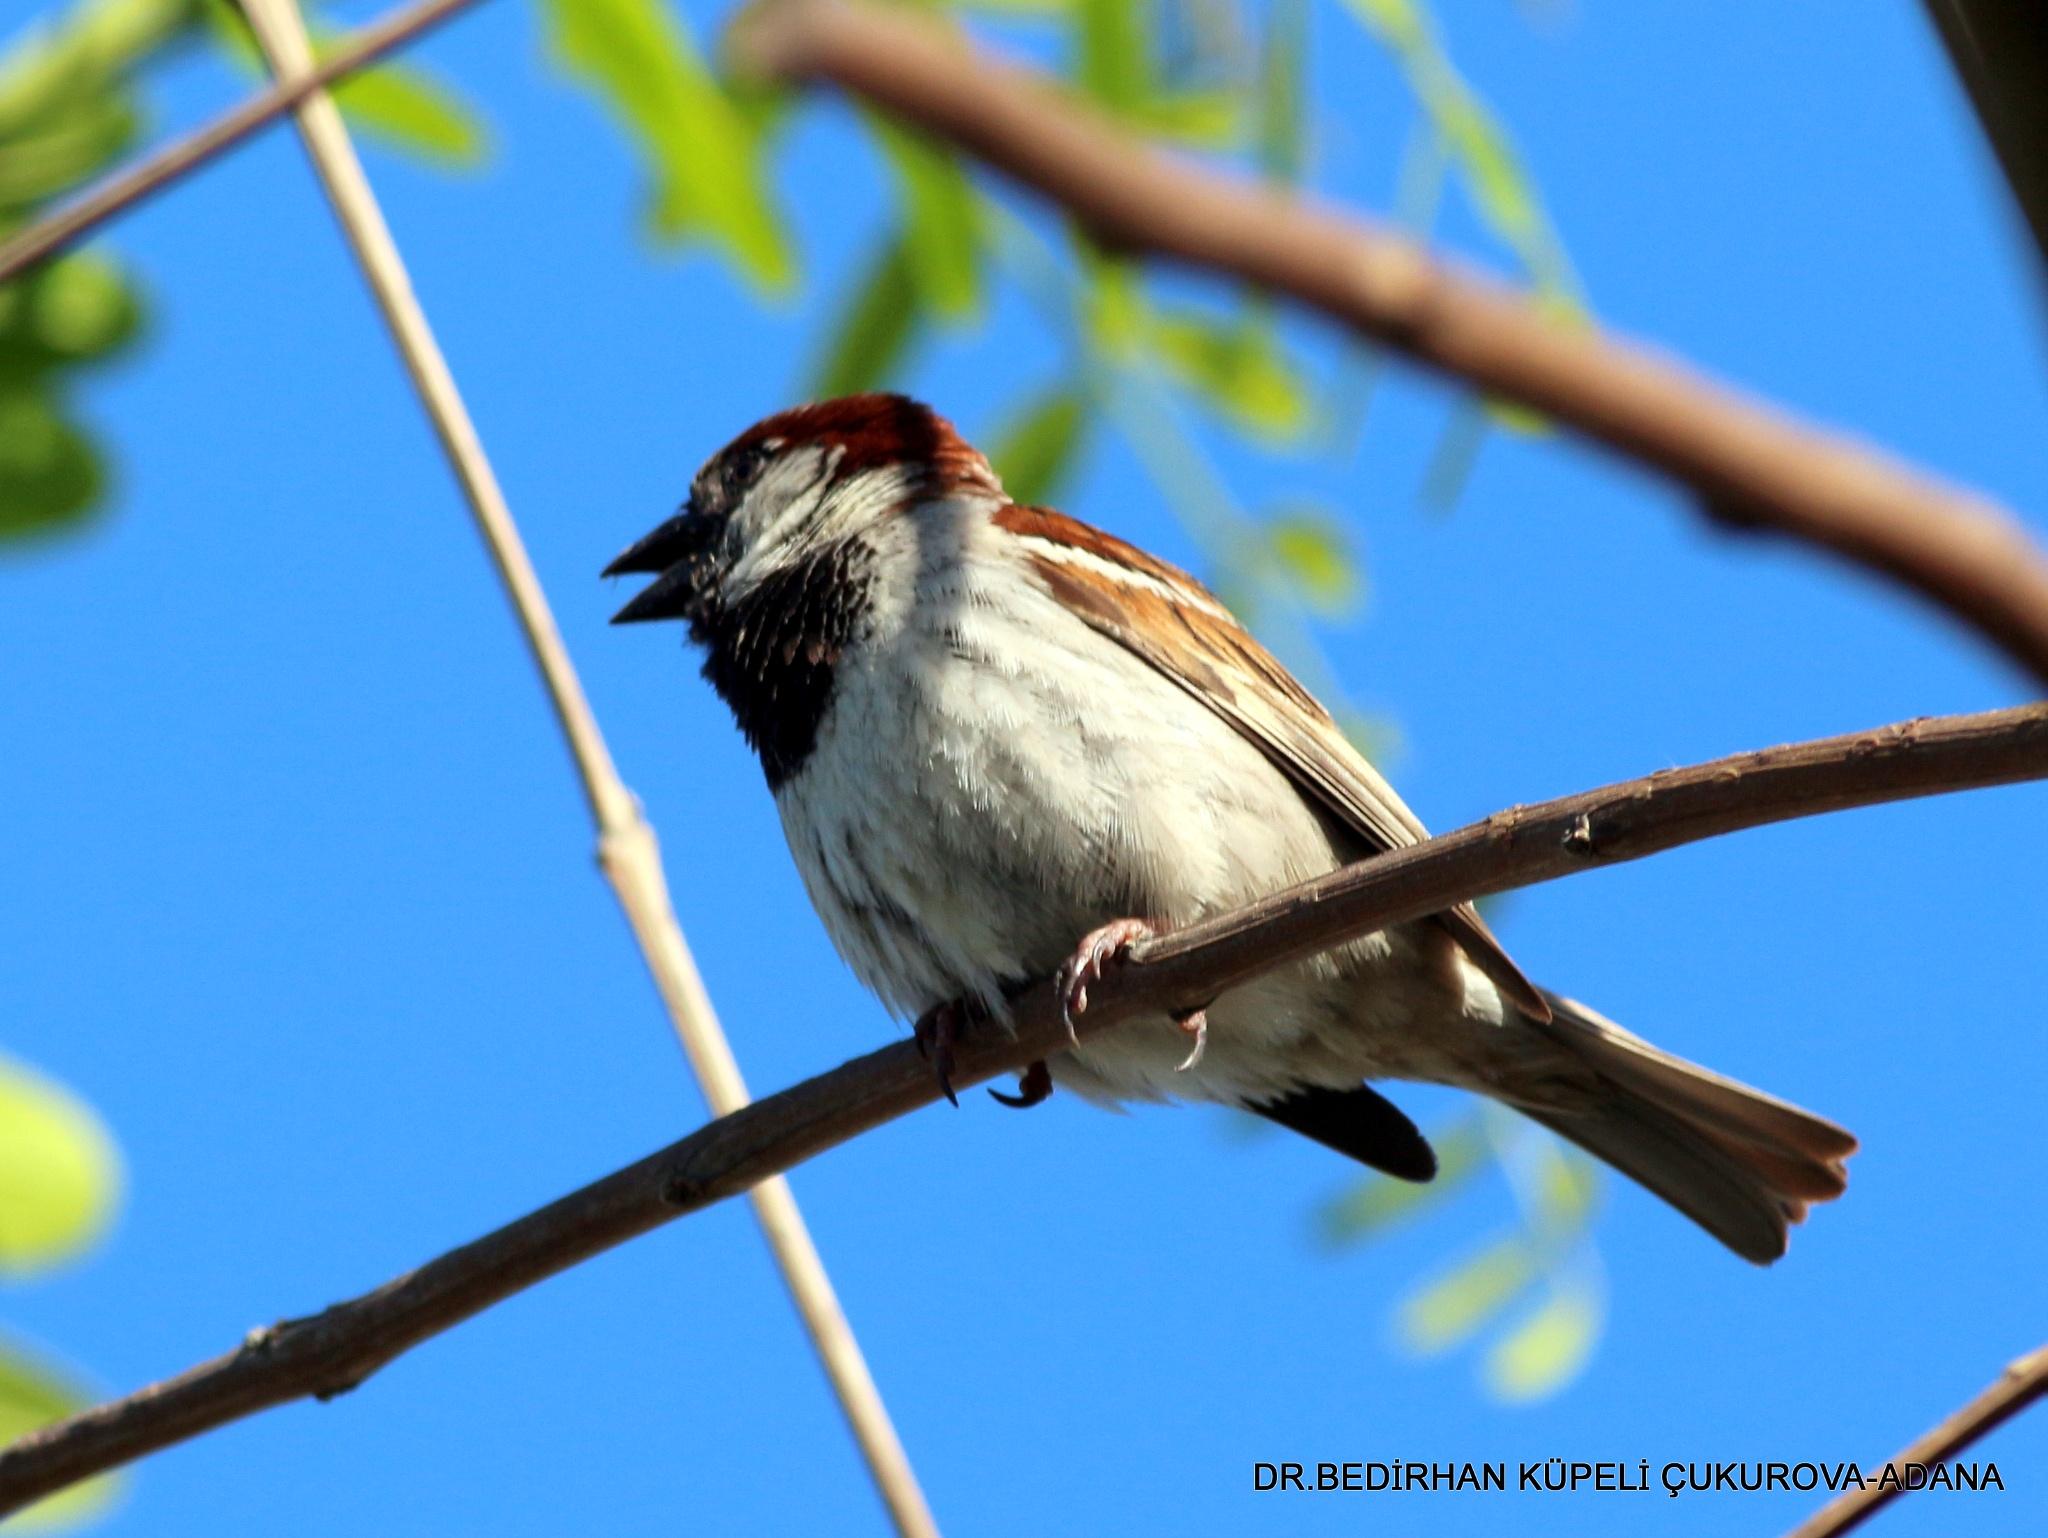 The House Sparrow is singing... by Bedirhan Küpeli